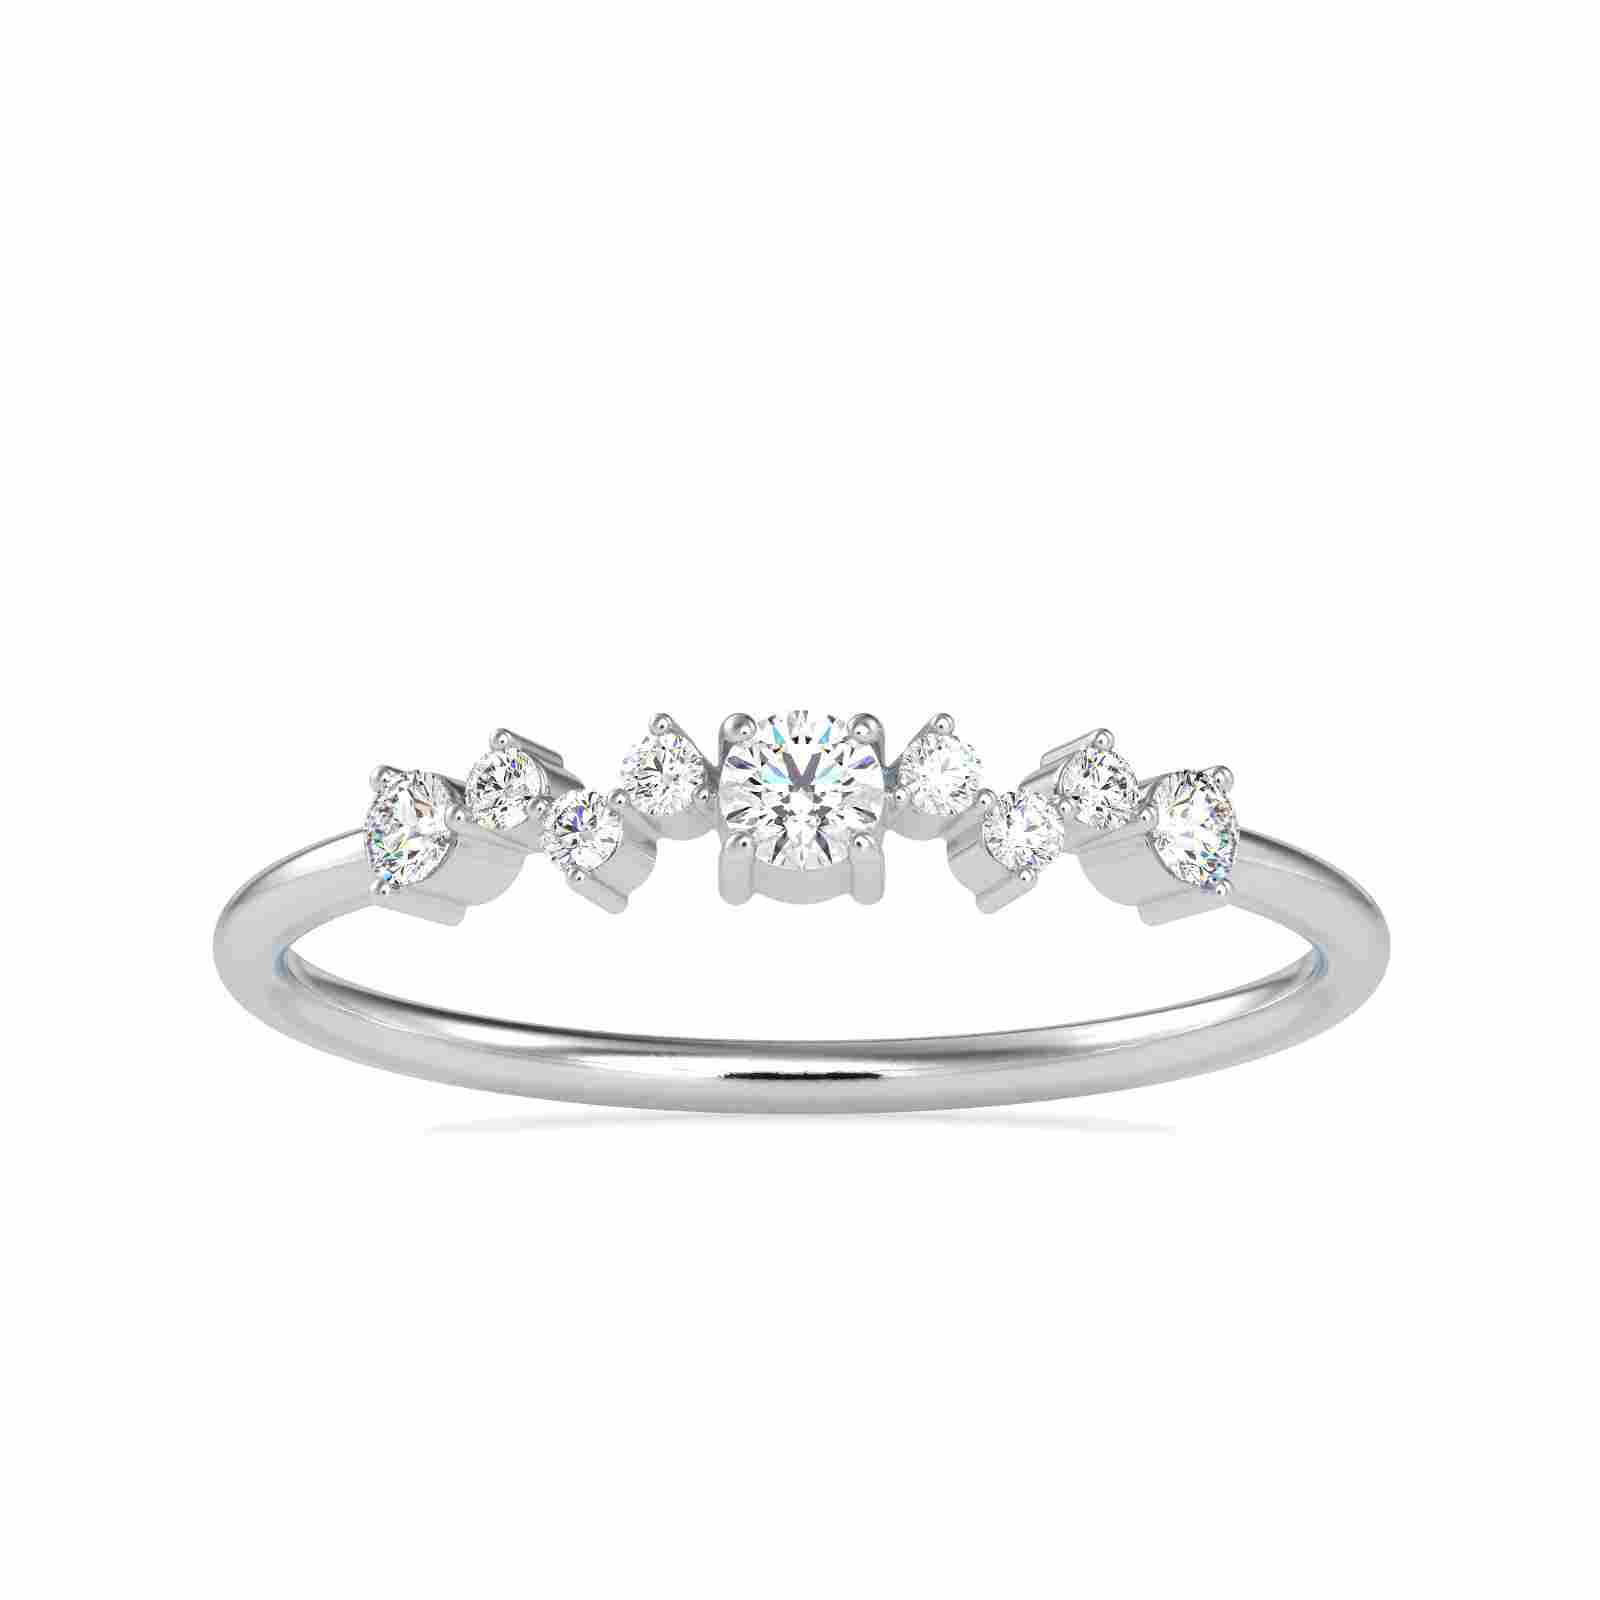 0.11CT Natural Diamond 14K White Gold Ring